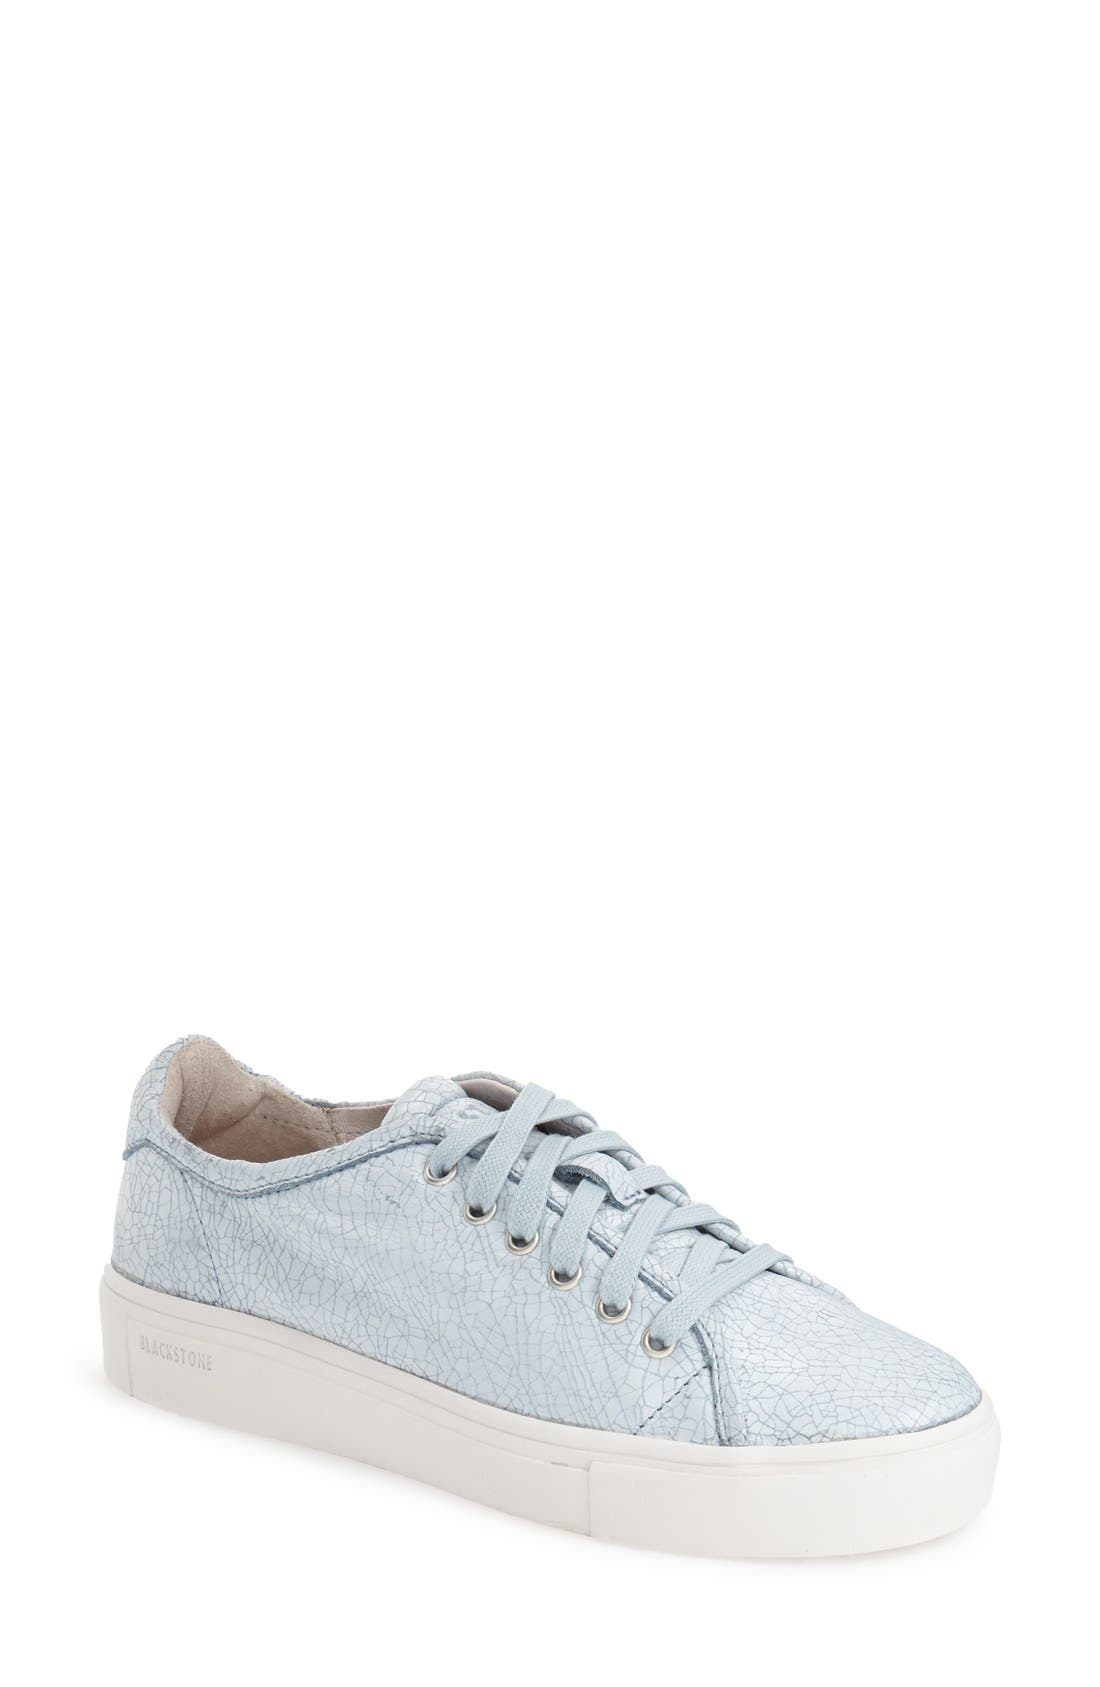 BLACKSTONE 'LL79' Low Top Platform Sneaker